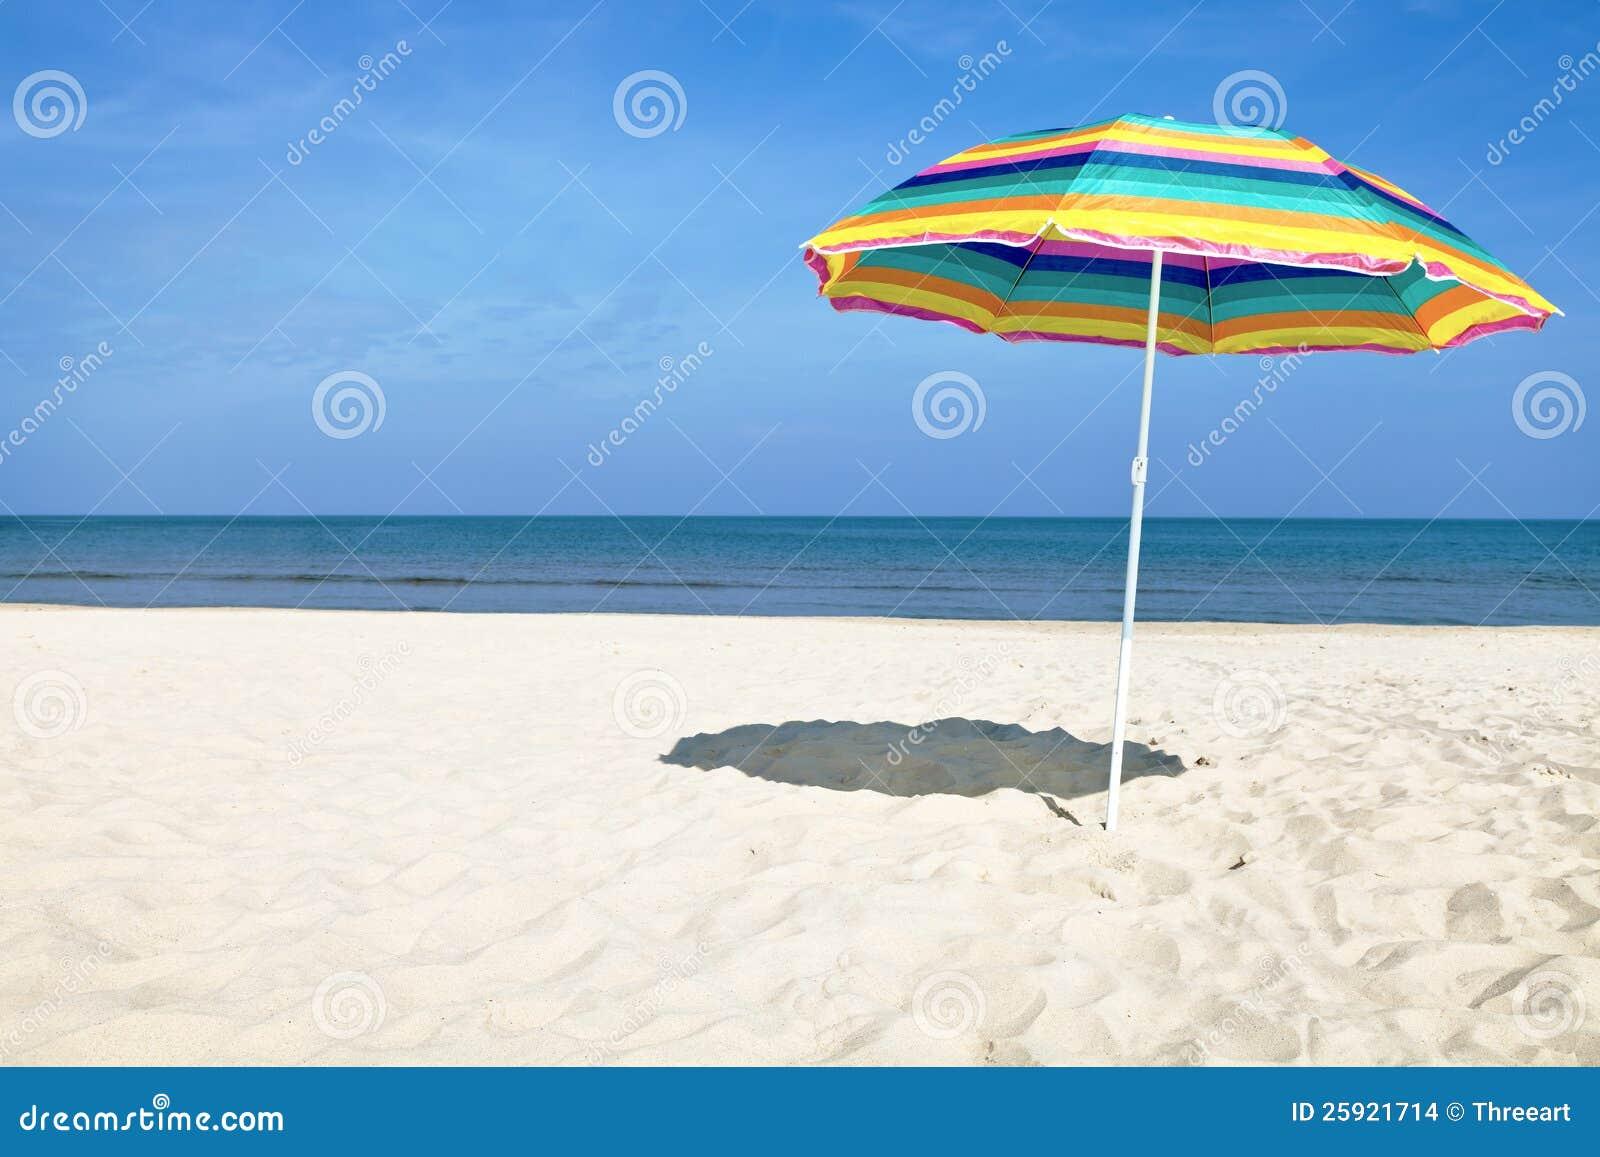 Beach umbrella colorful beach umbrella on the